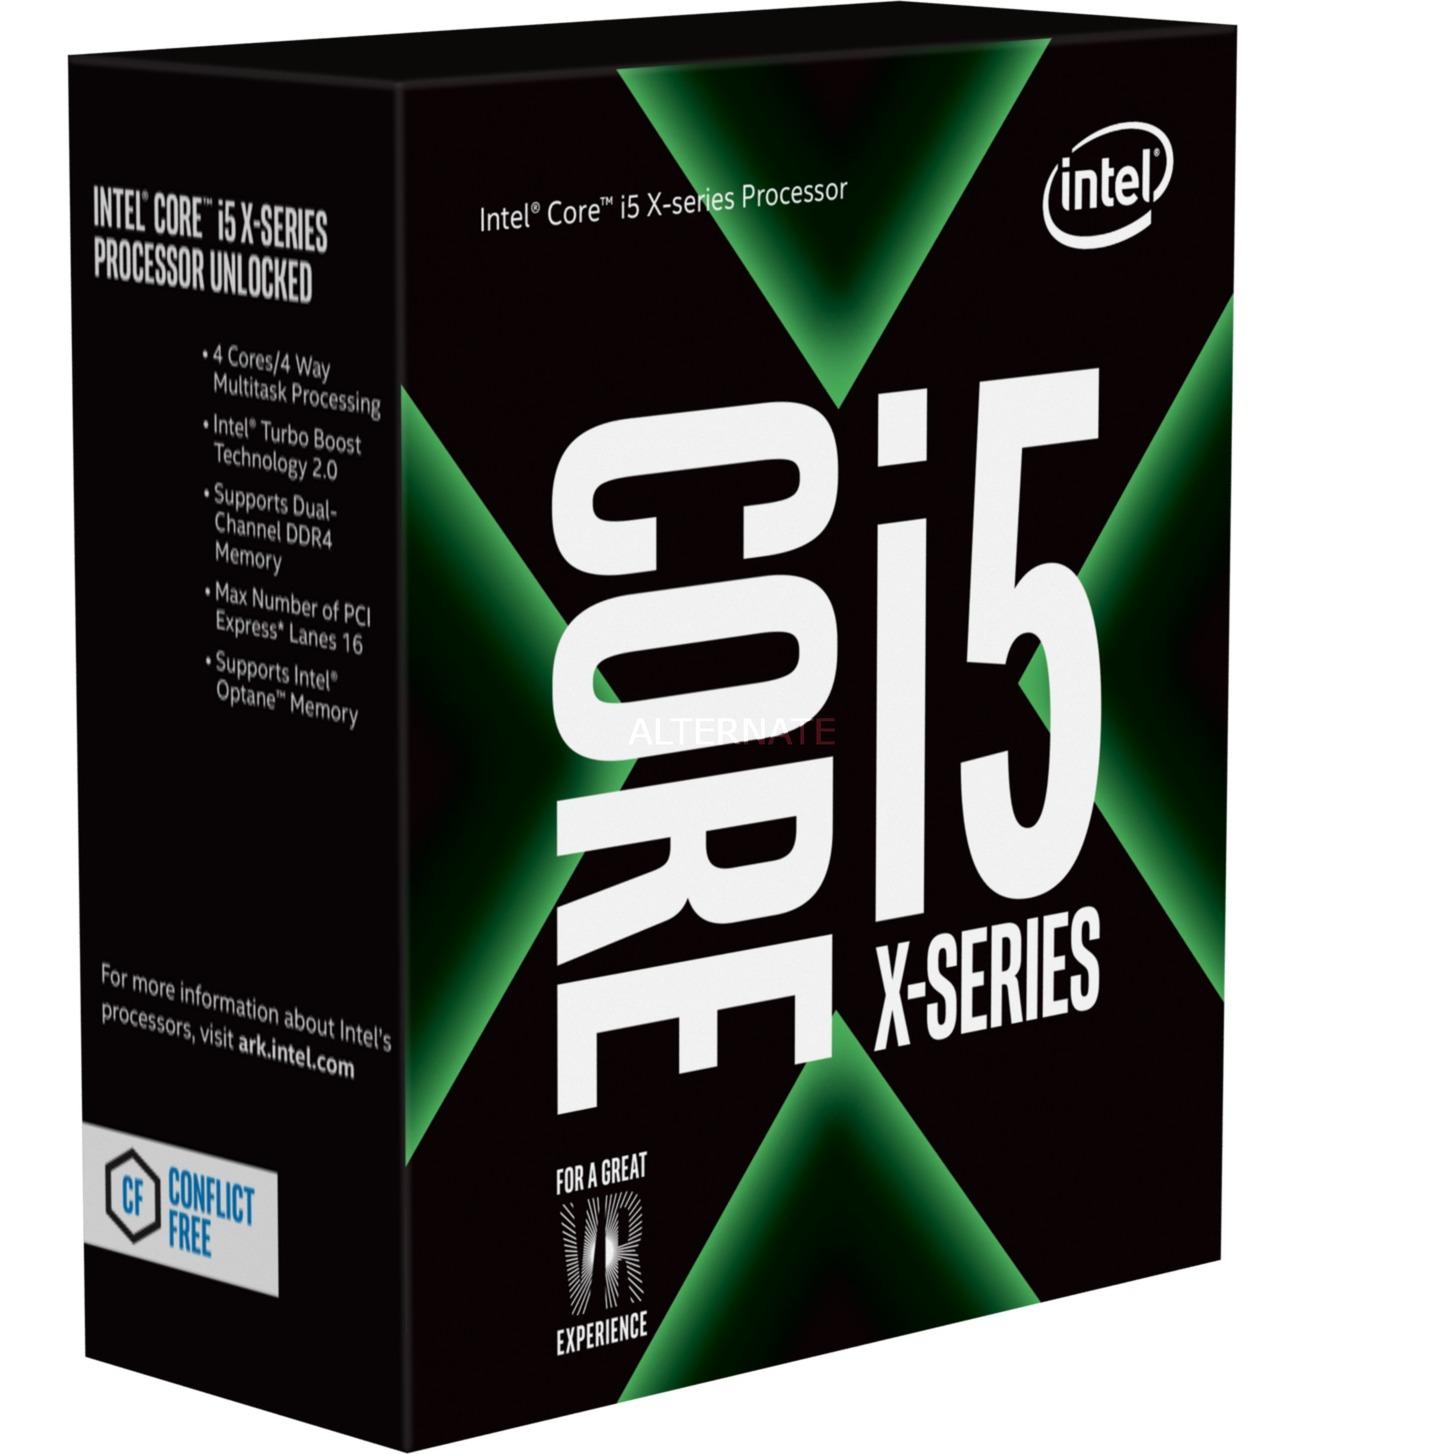 Core i5-7640X X-series Processor (6M Cache, up to 4.20 GHz) 4GHz 6MB Smart Cache Caja procesador